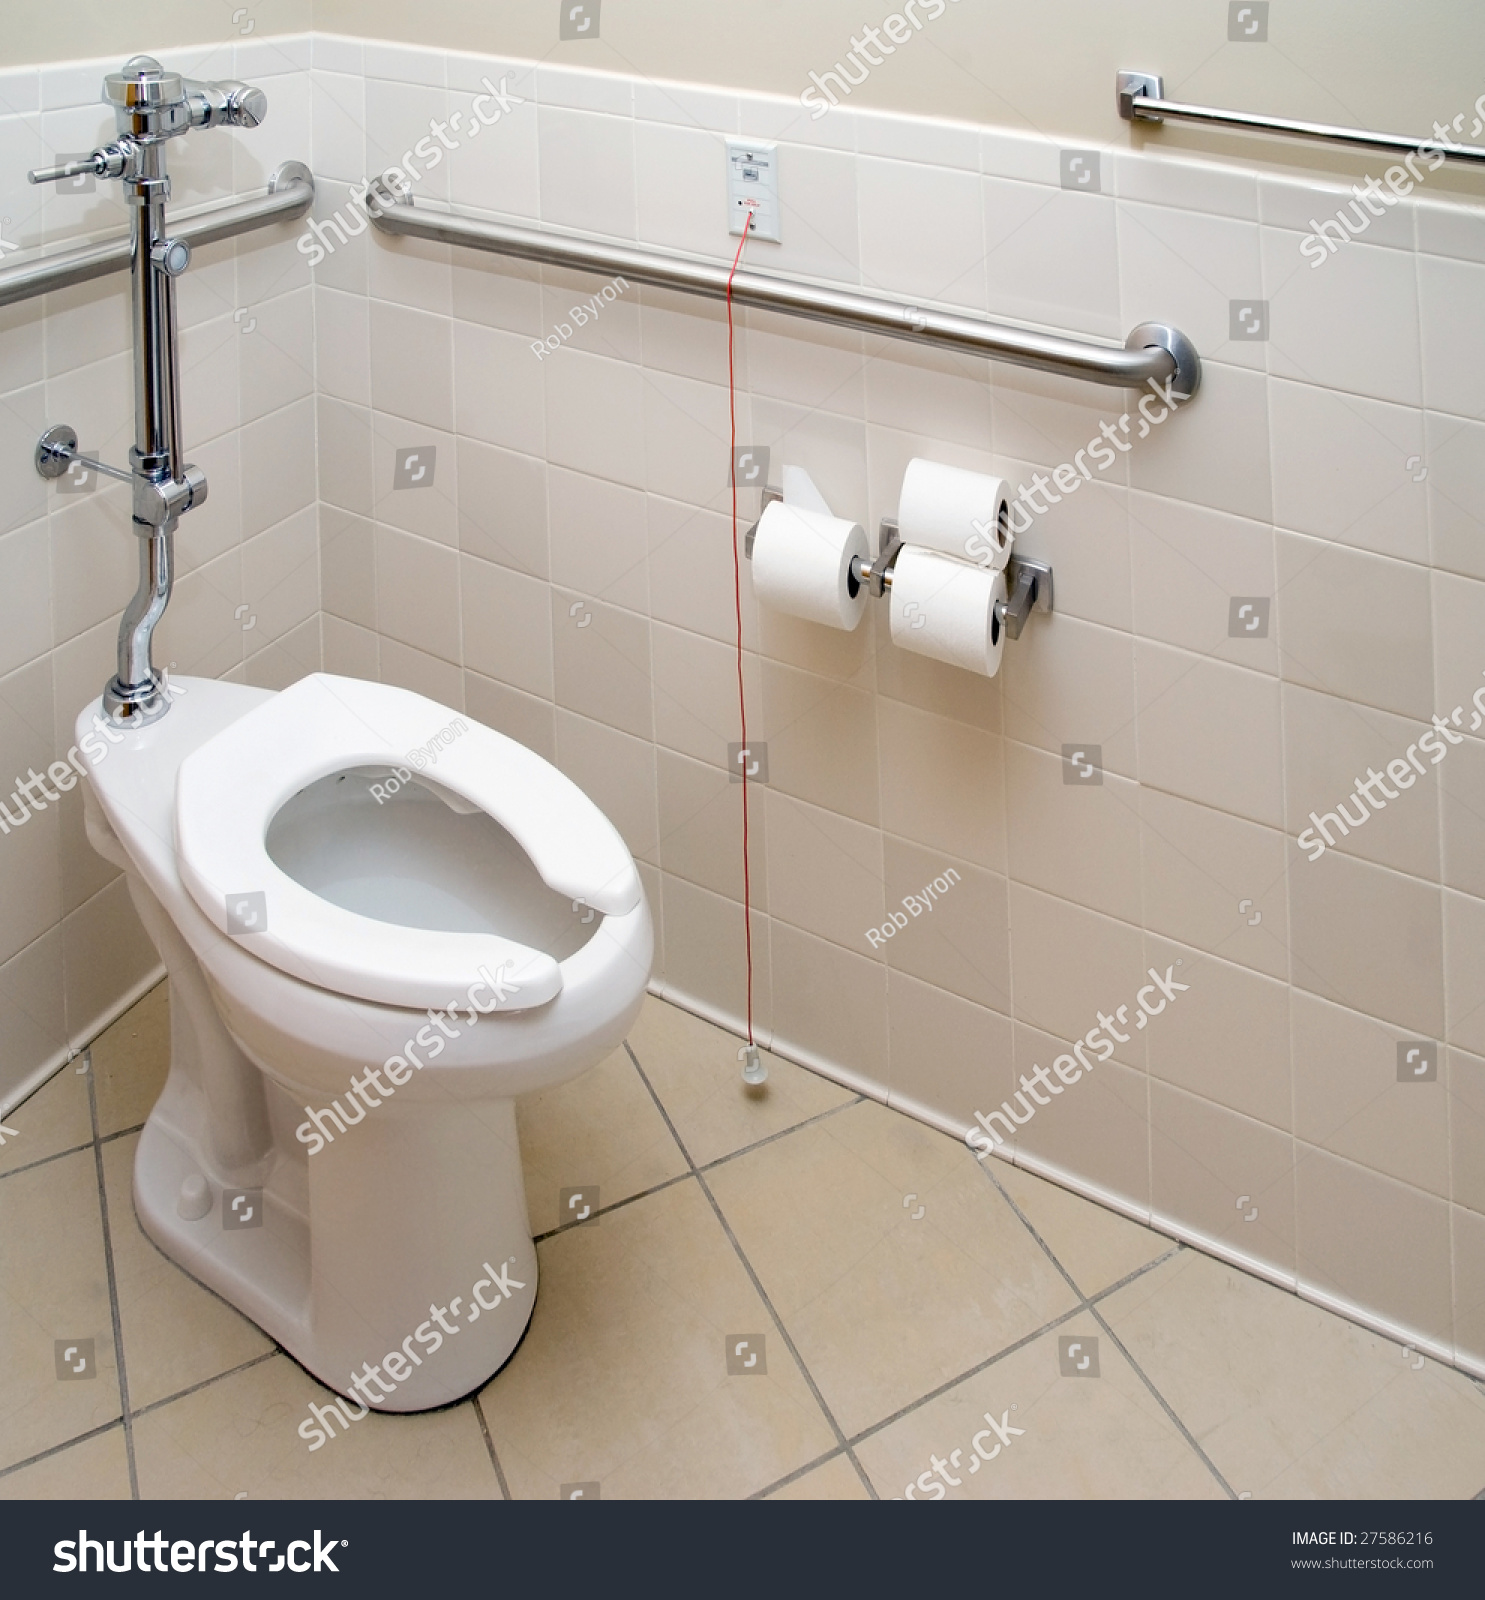 hospital bathroom. Hospital Room Bathroom Stock Photo 27586216  Shutterstock